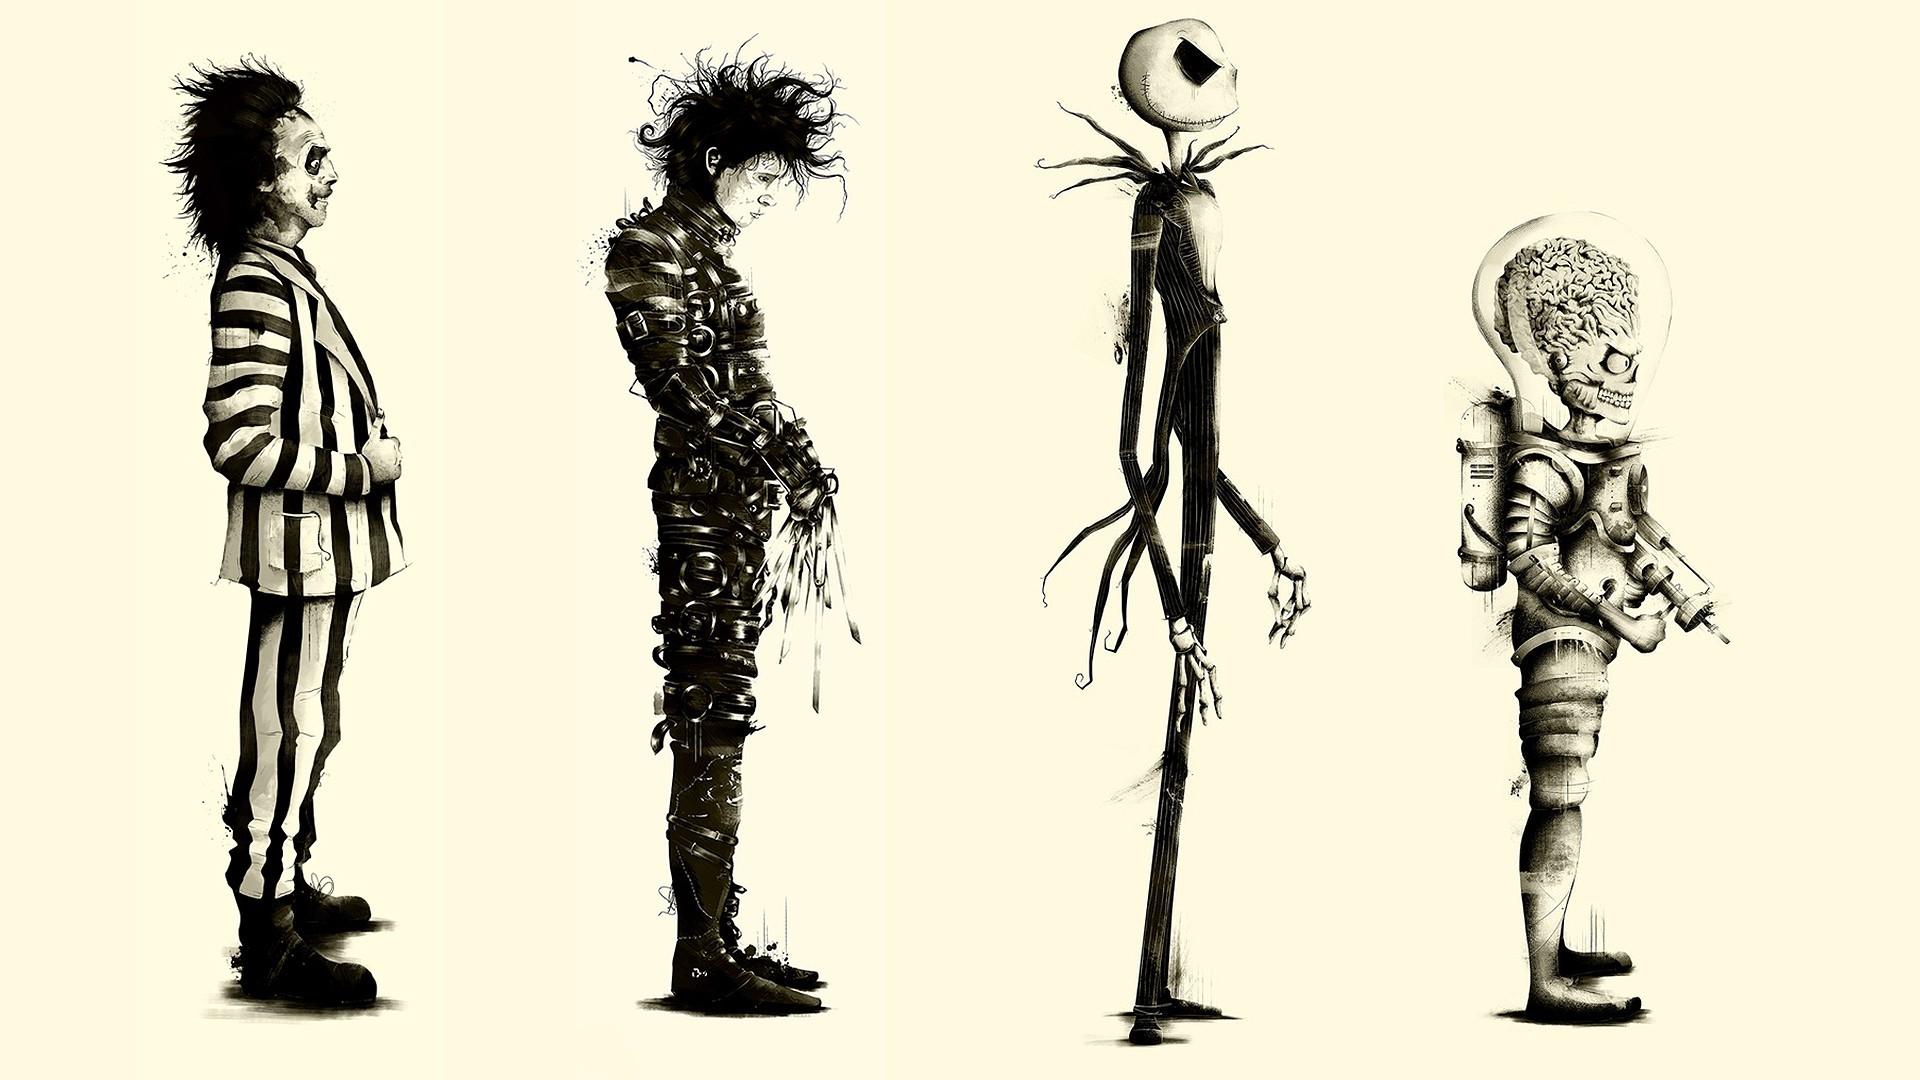 Wallpaper Illustration Silhouette Movies Cartoon Fan Art Skeleton Edward Scissorhands Tim Burton Mars Attacks Beetlejuice Art Sketch 1920x1080 Px Black And White Monochrome Photography Modern Art Font Figure Drawing 1920x1080